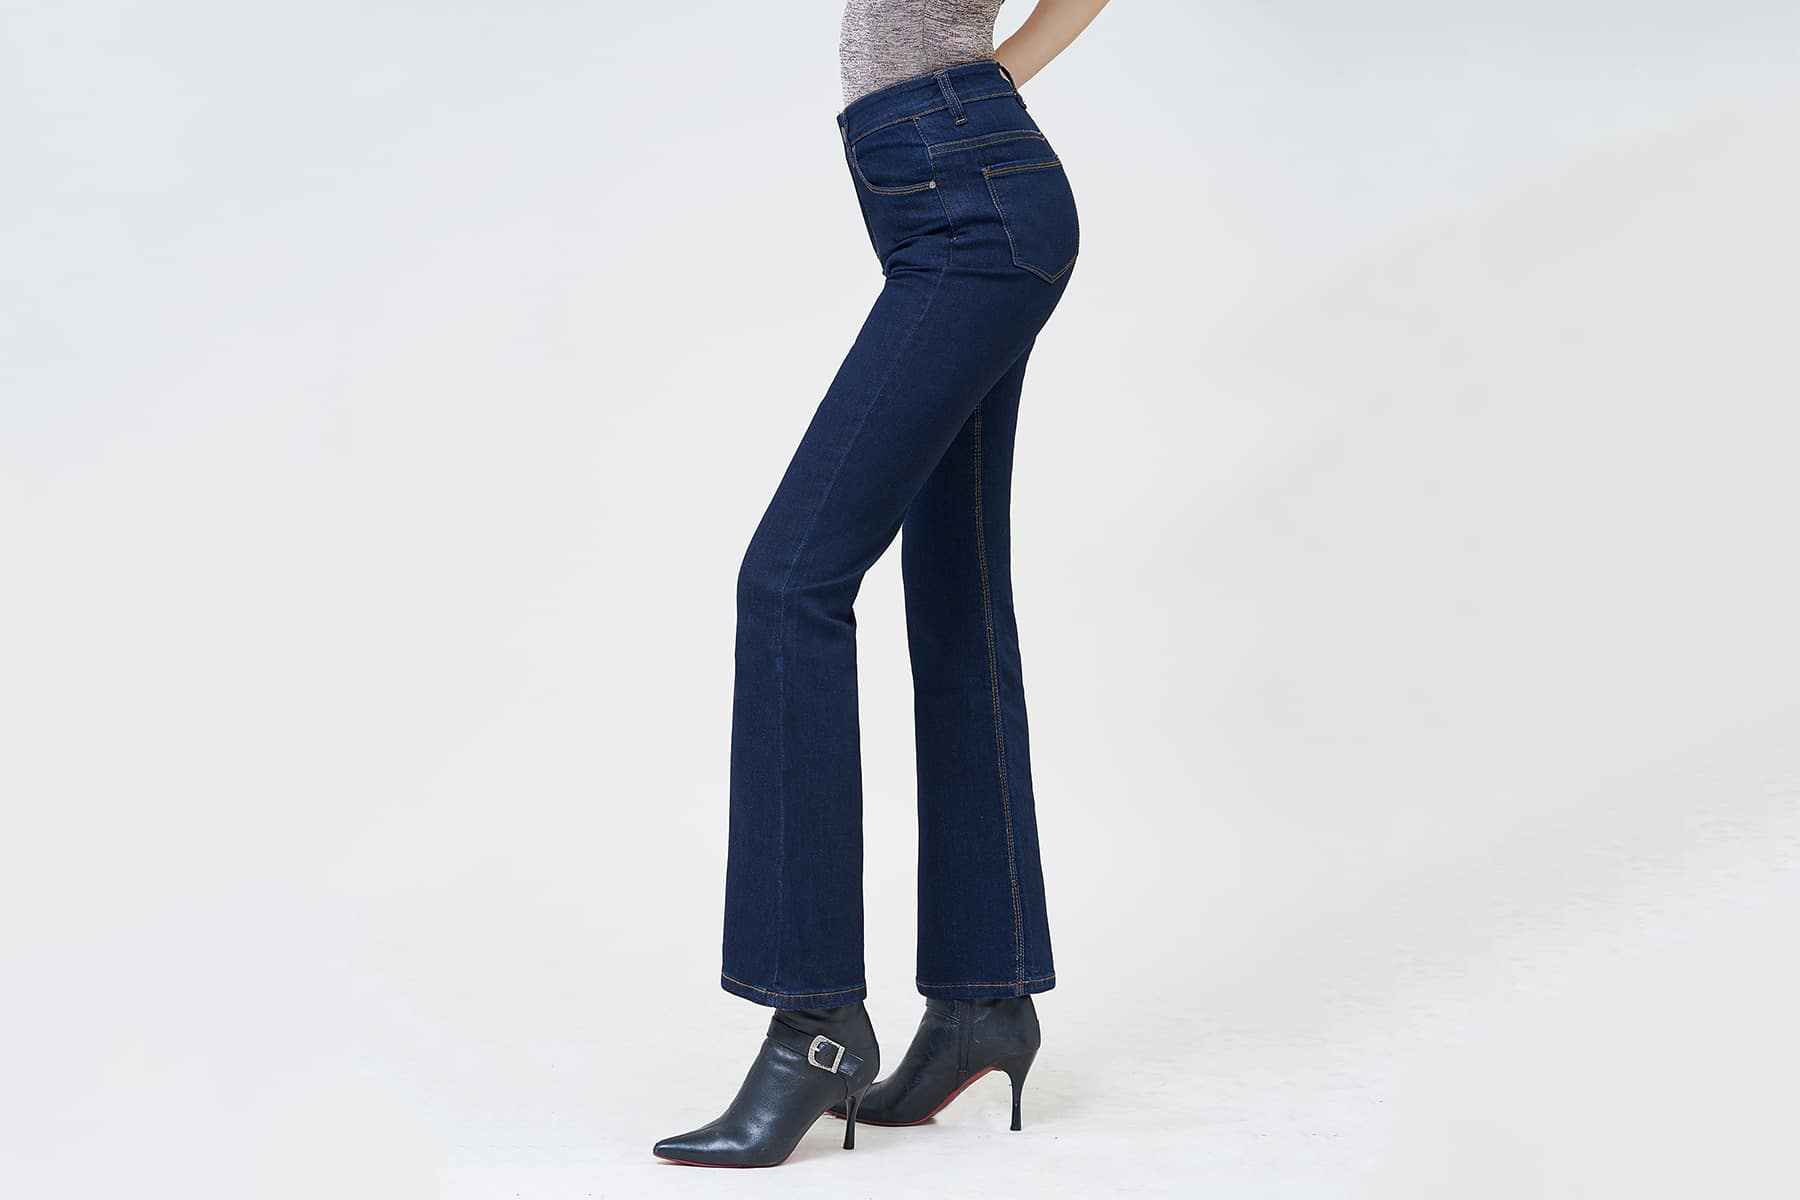 Quần jean nữ Aaajeans ống loe xanh đậm